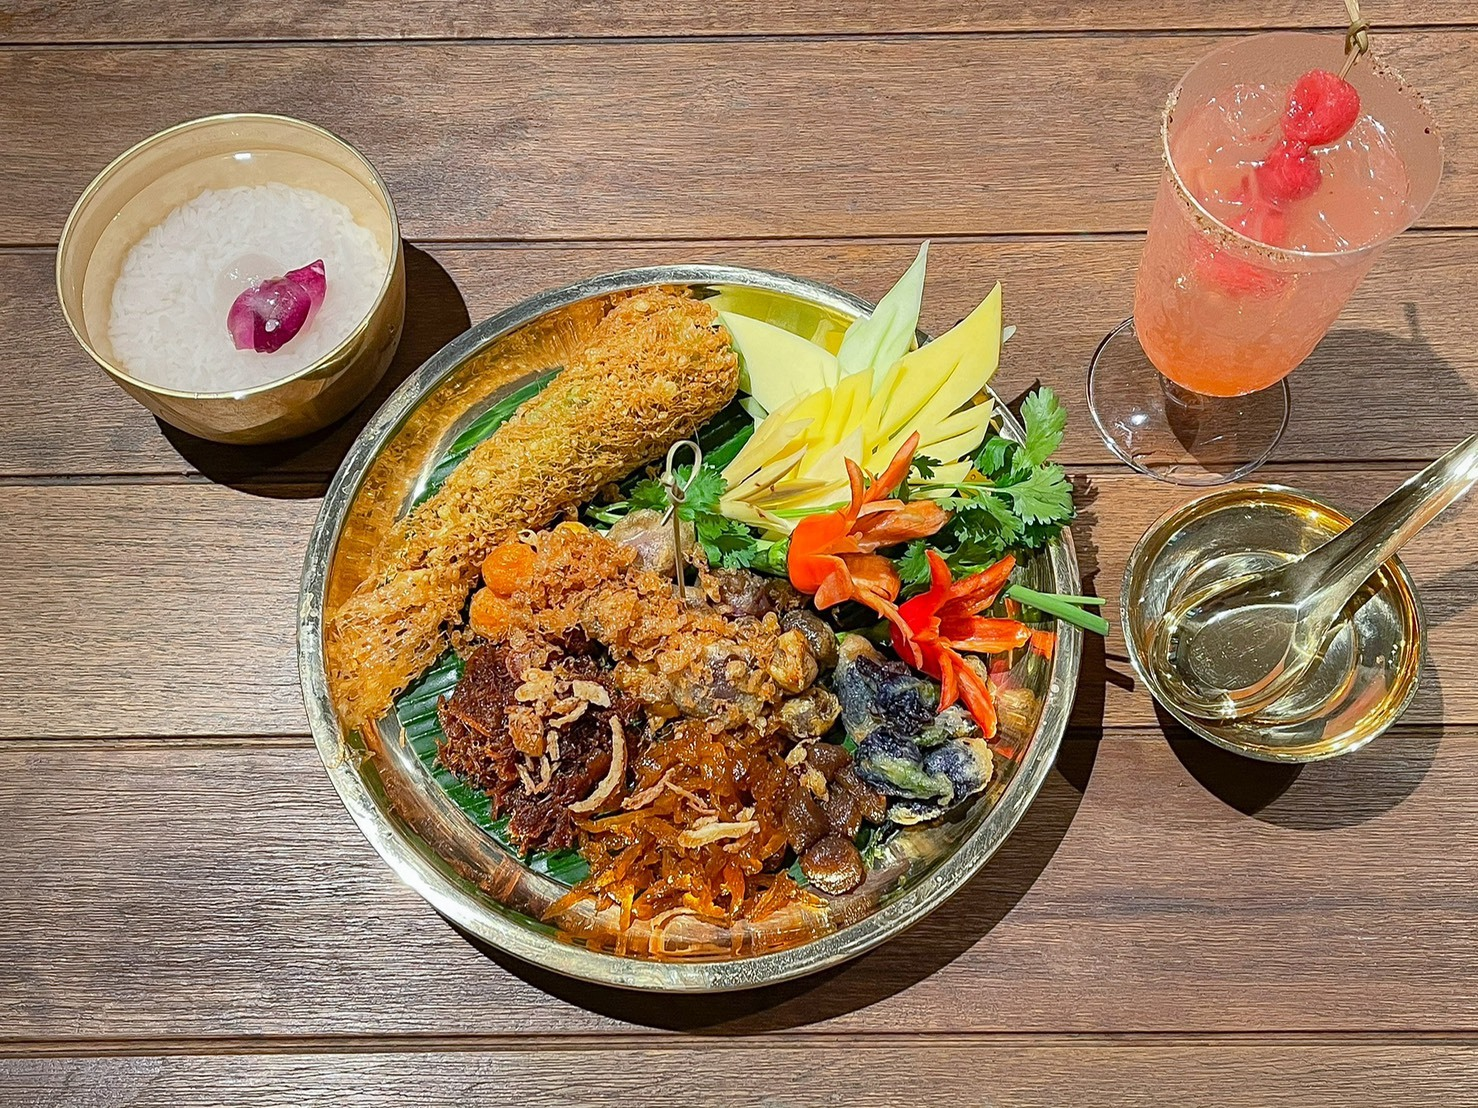 Khao Chae/Siam Tea Room